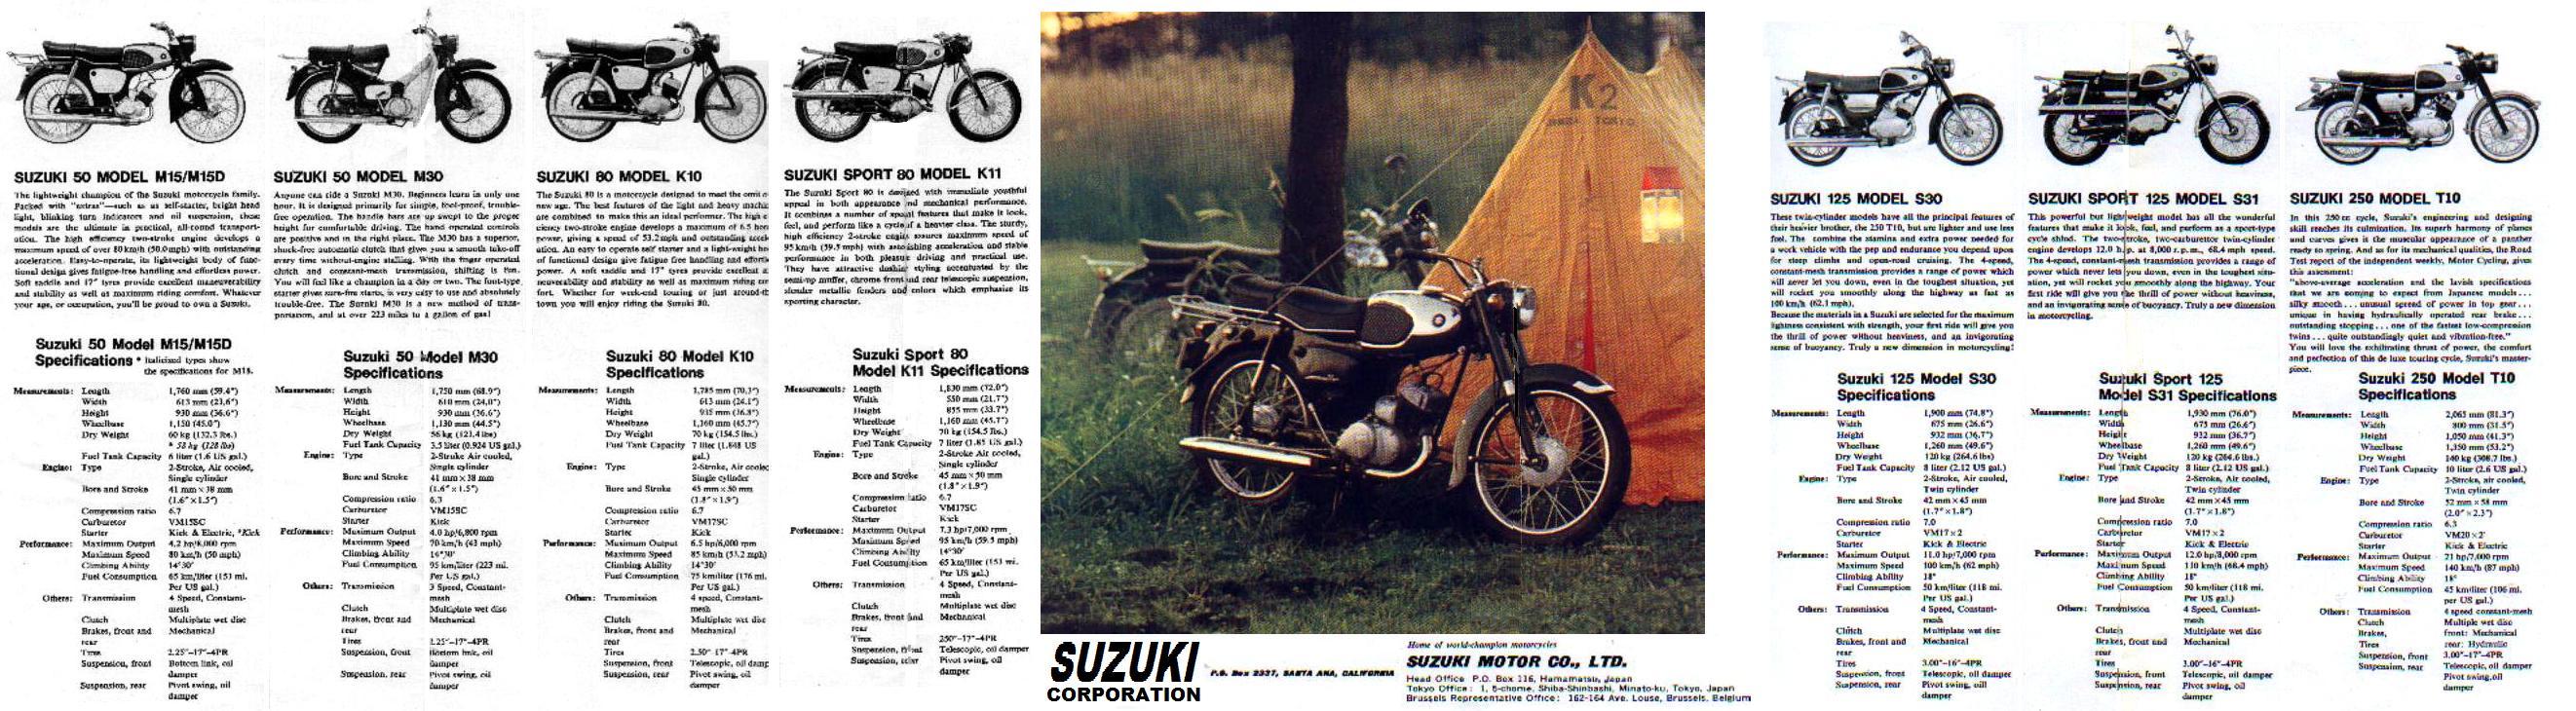 Suzuki Myrons Mopeds Fz50 Wiring Diagram 1964 Usa Models